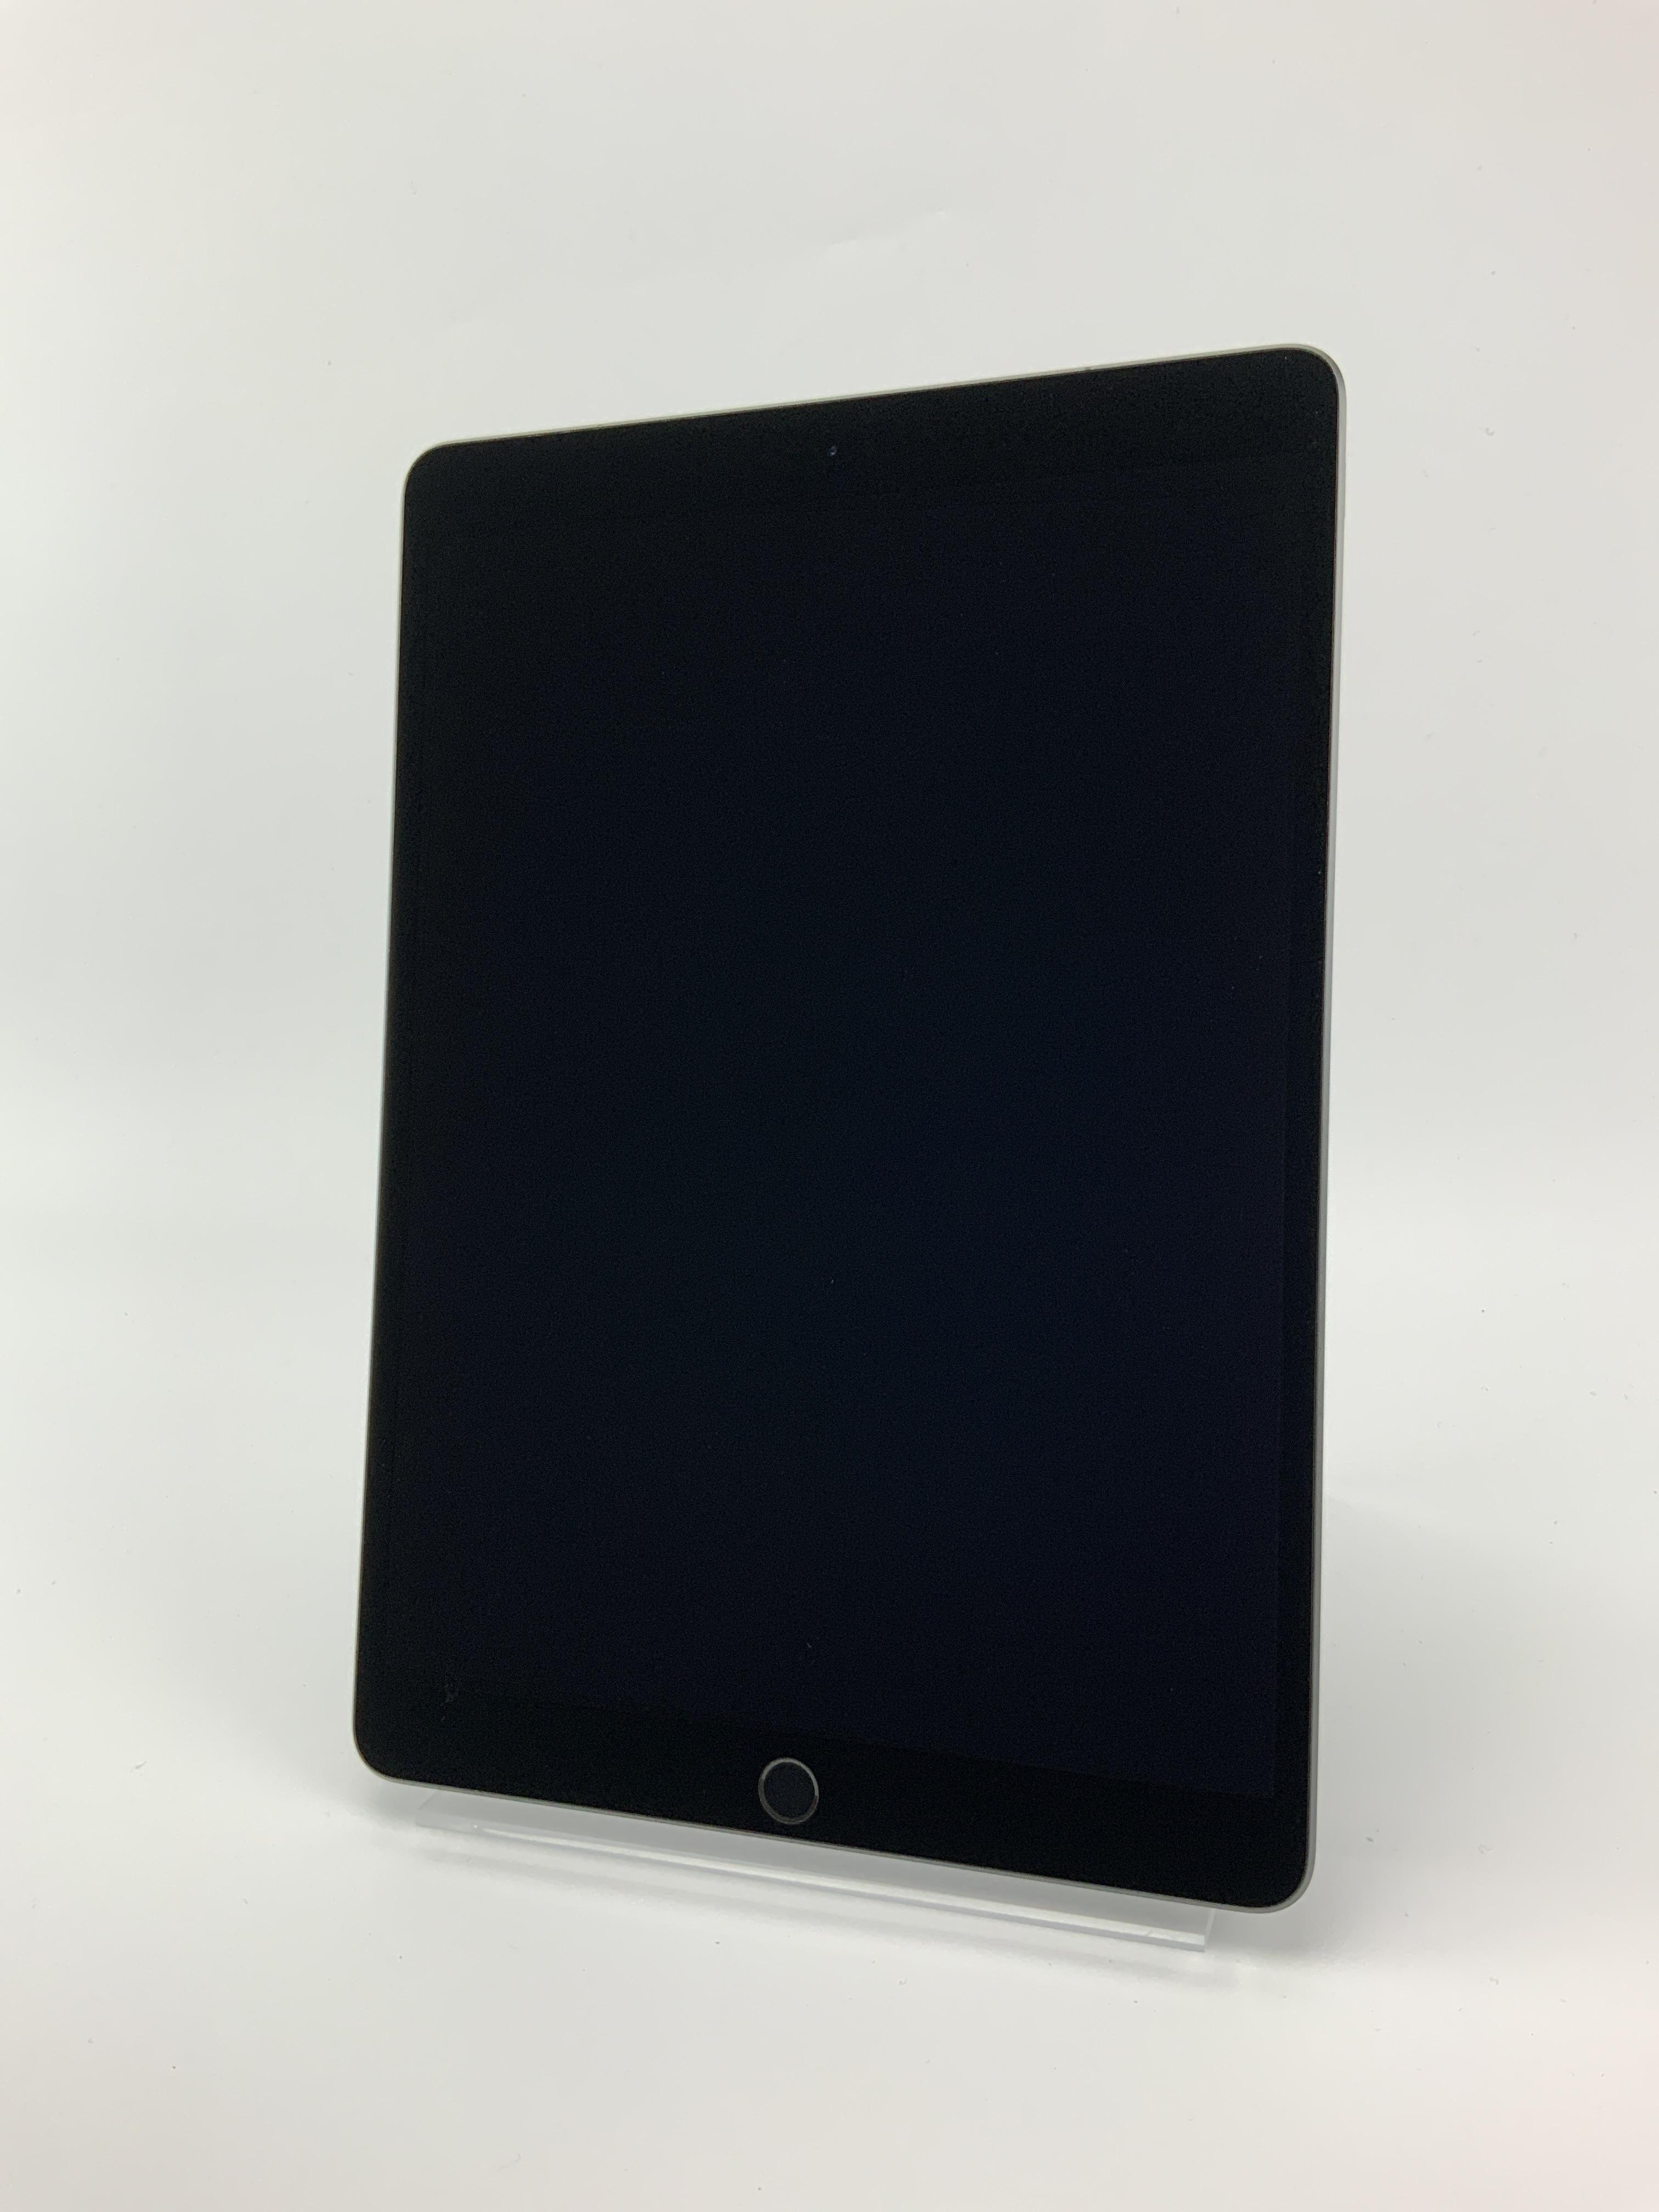 iPad Air 3 Wi-Fi + Cellular 64GB, 64GB, Space Gray, Bild 1